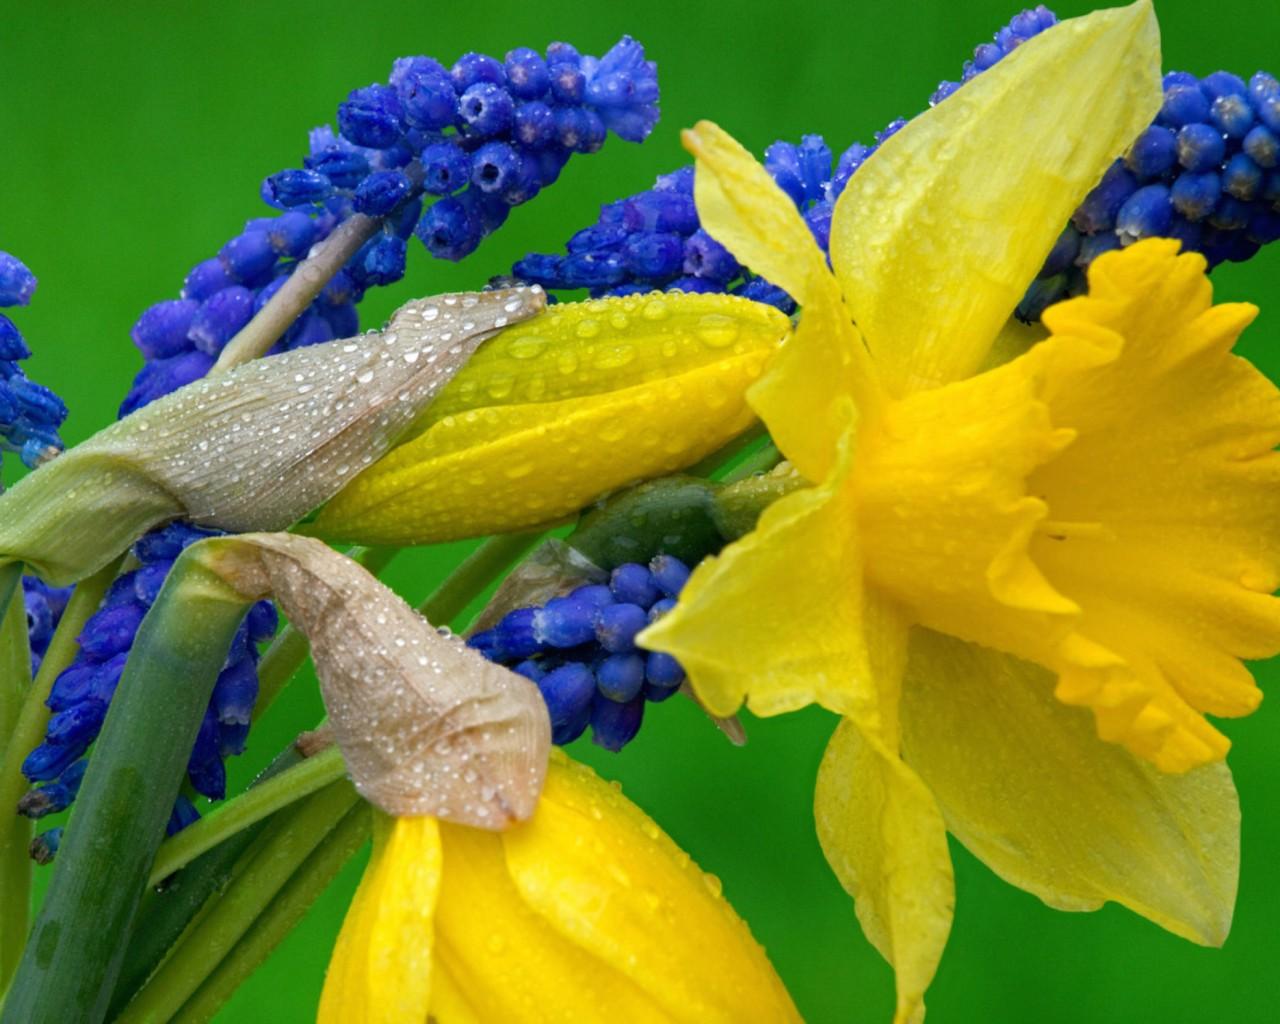 daffodils and grape hyacinth wallpaper - free downloads